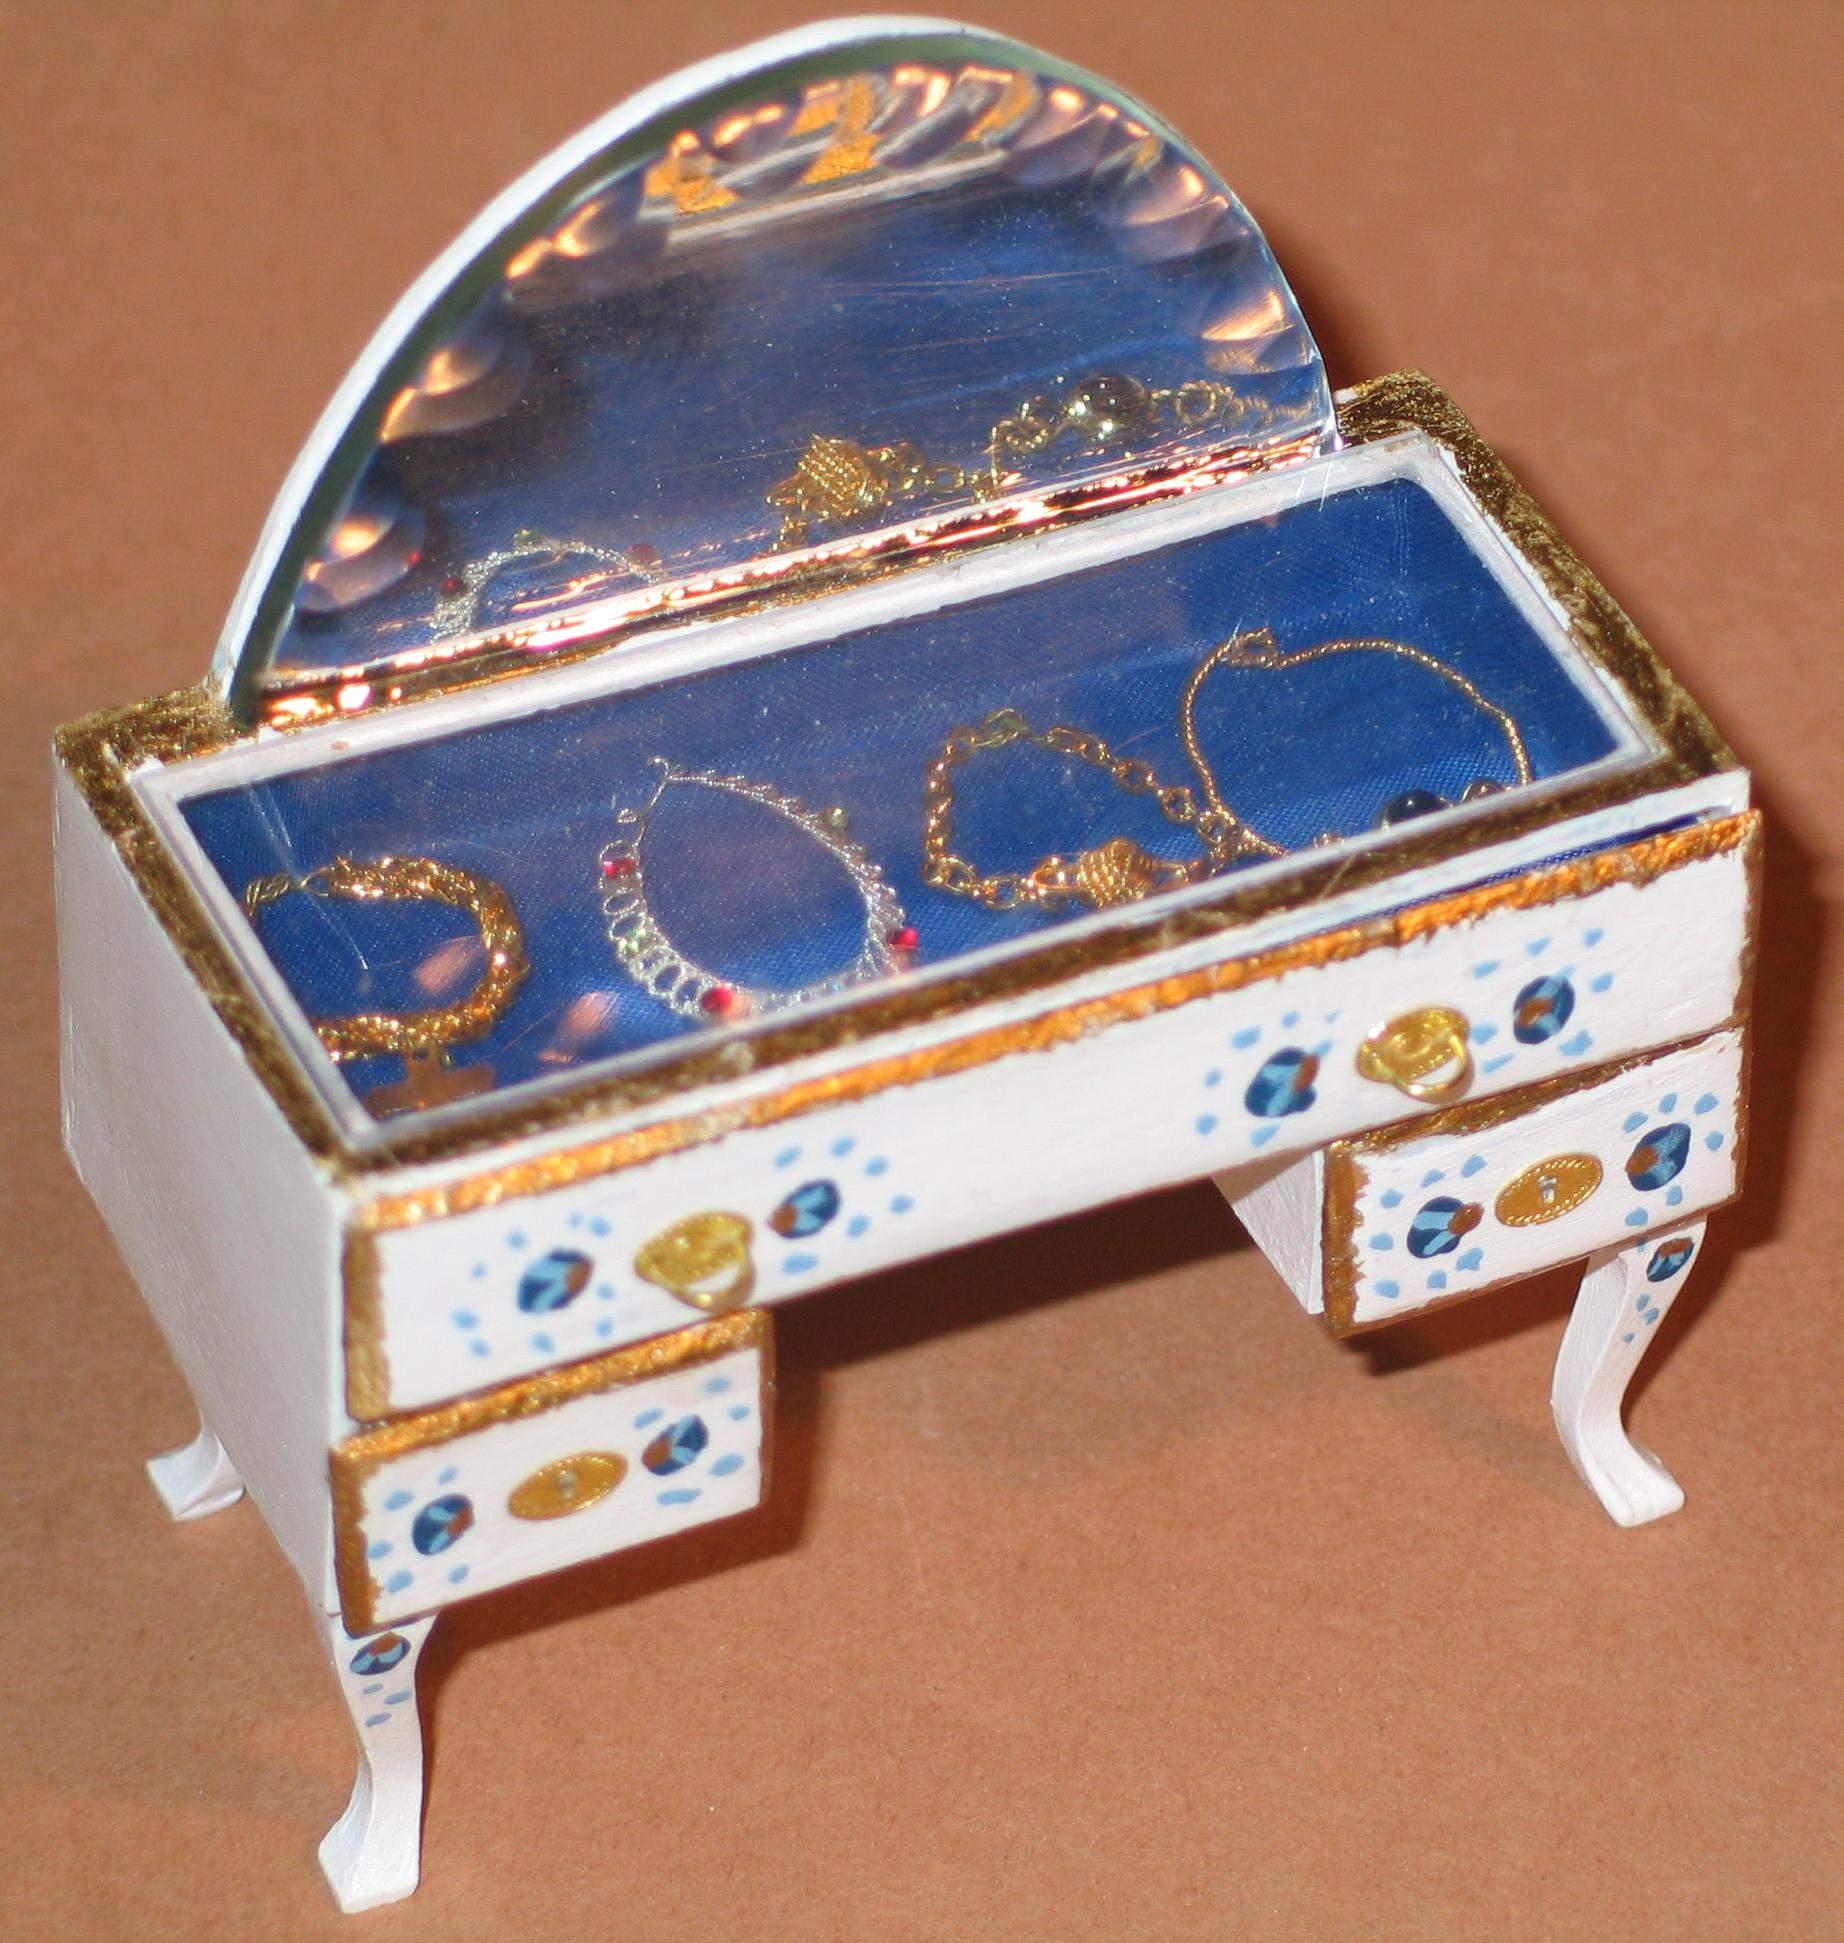 puppenhausminiaturen. Black Bedroom Furniture Sets. Home Design Ideas